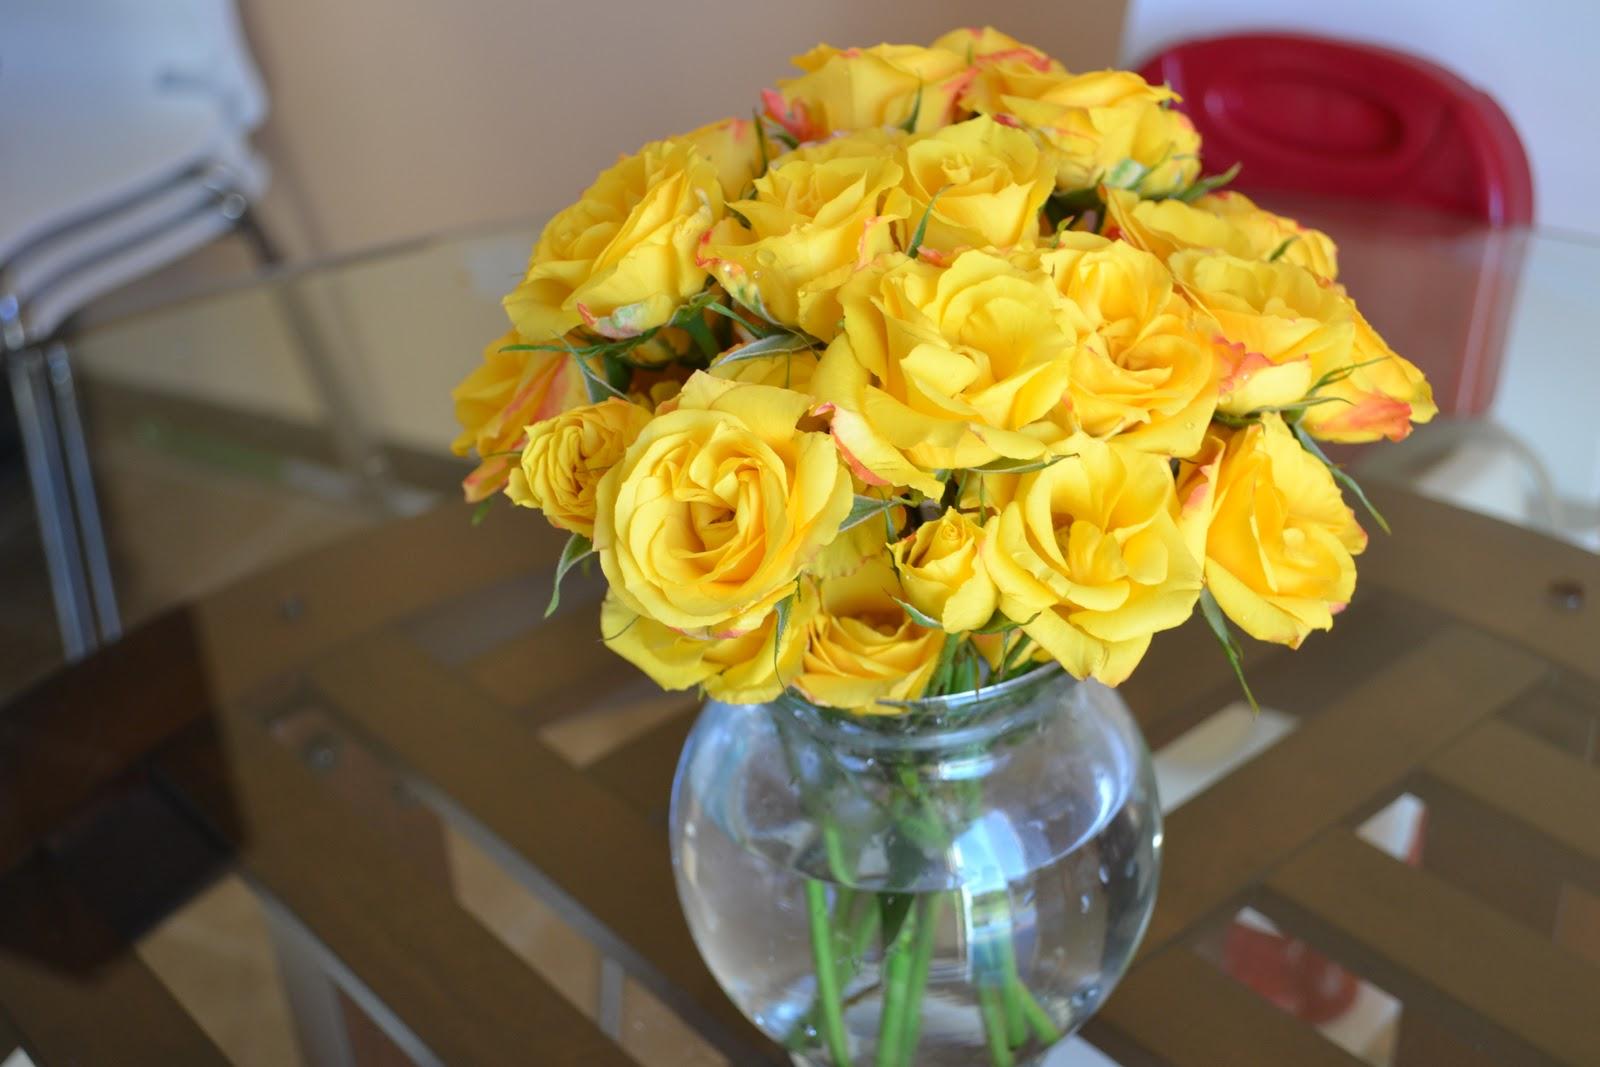 A little sunny flowers